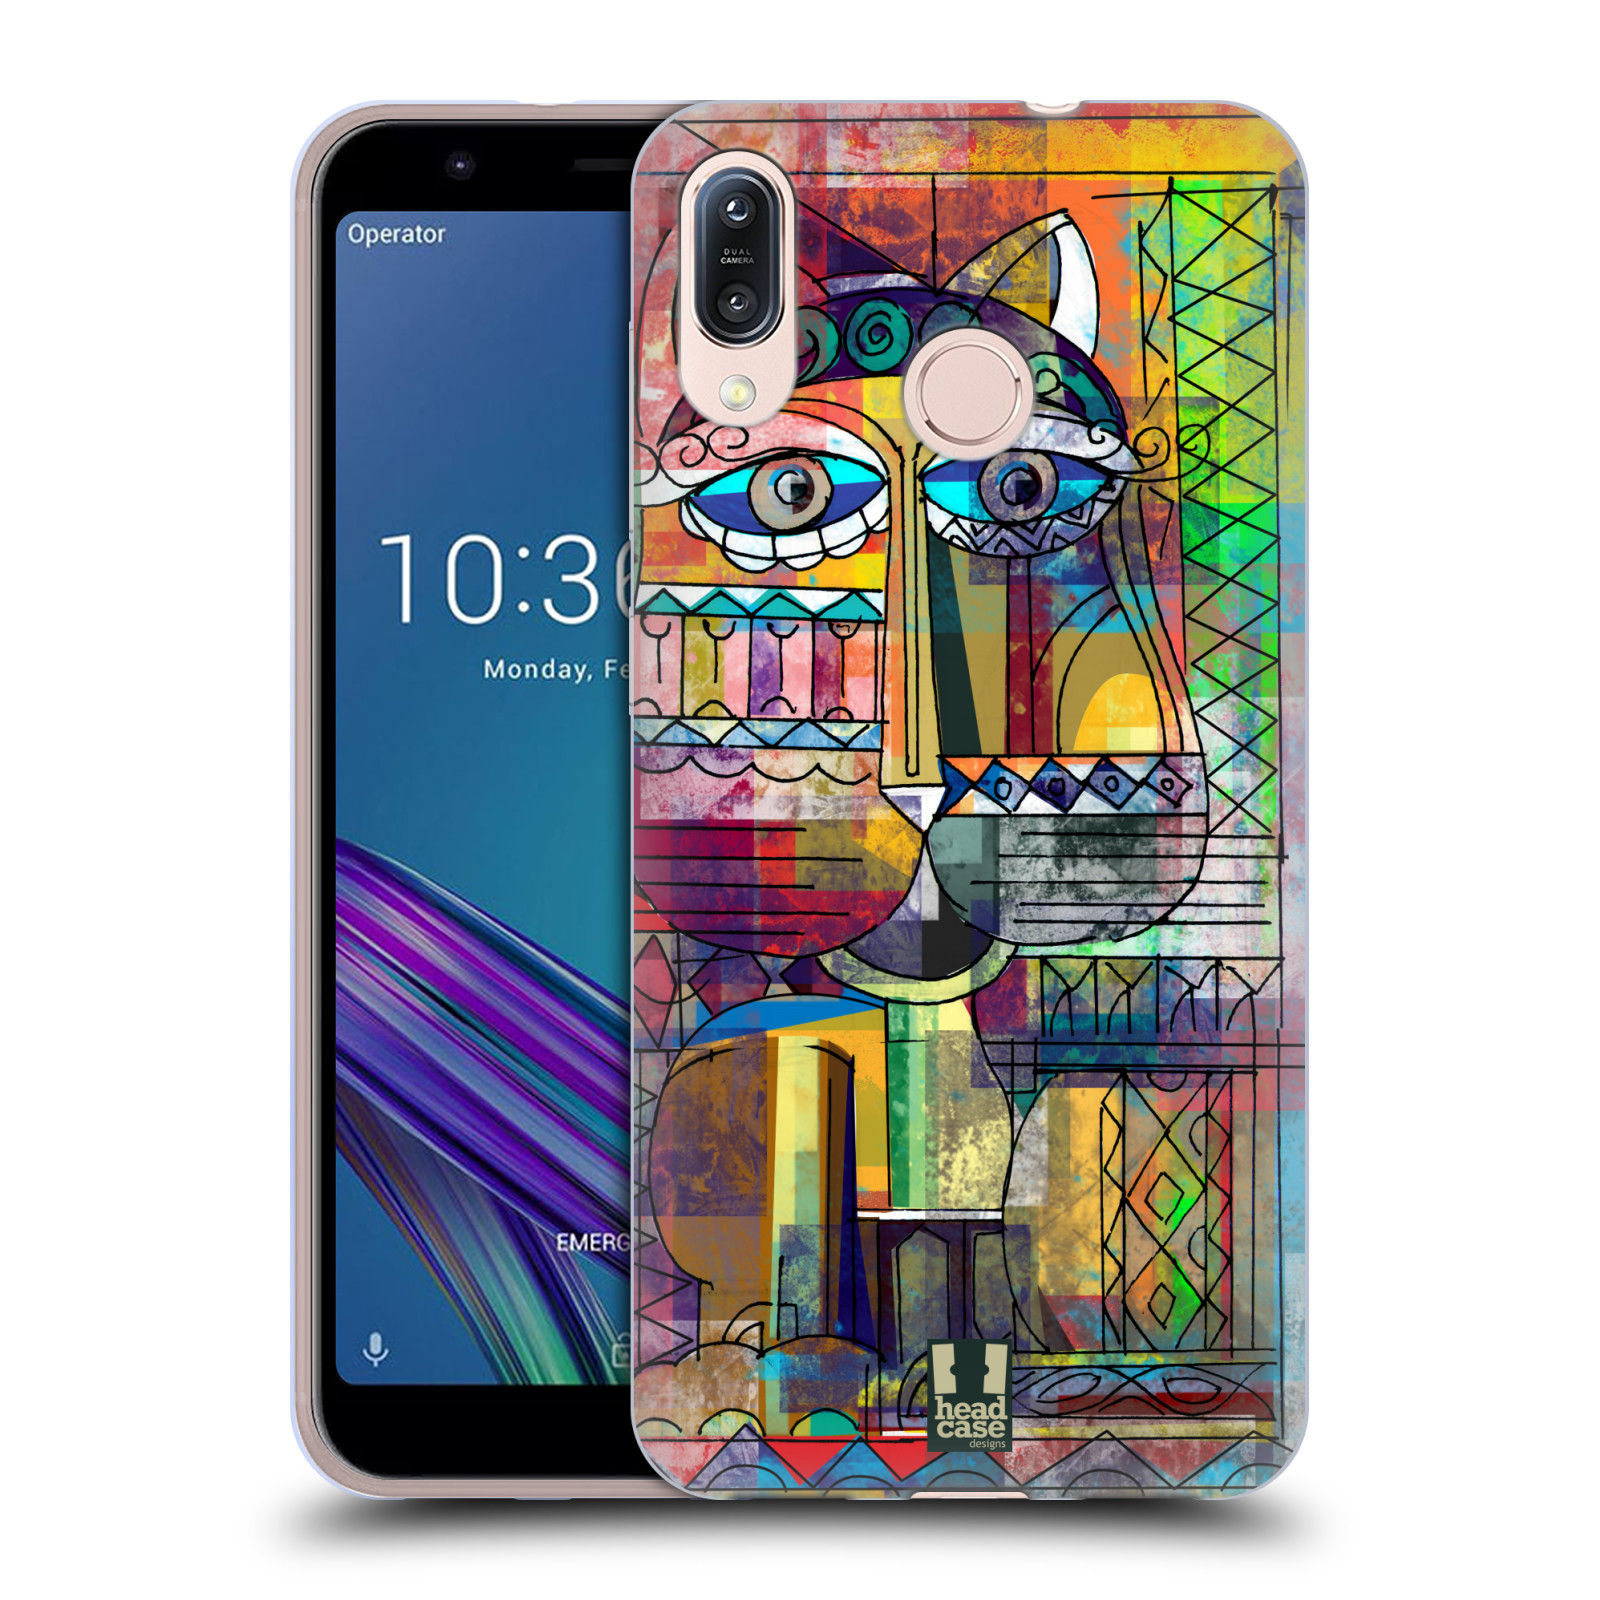 Silikonové pouzdro na mobil Asus Zenfone Max M1 ZB555KL - Head Case - AZTEC KORAT